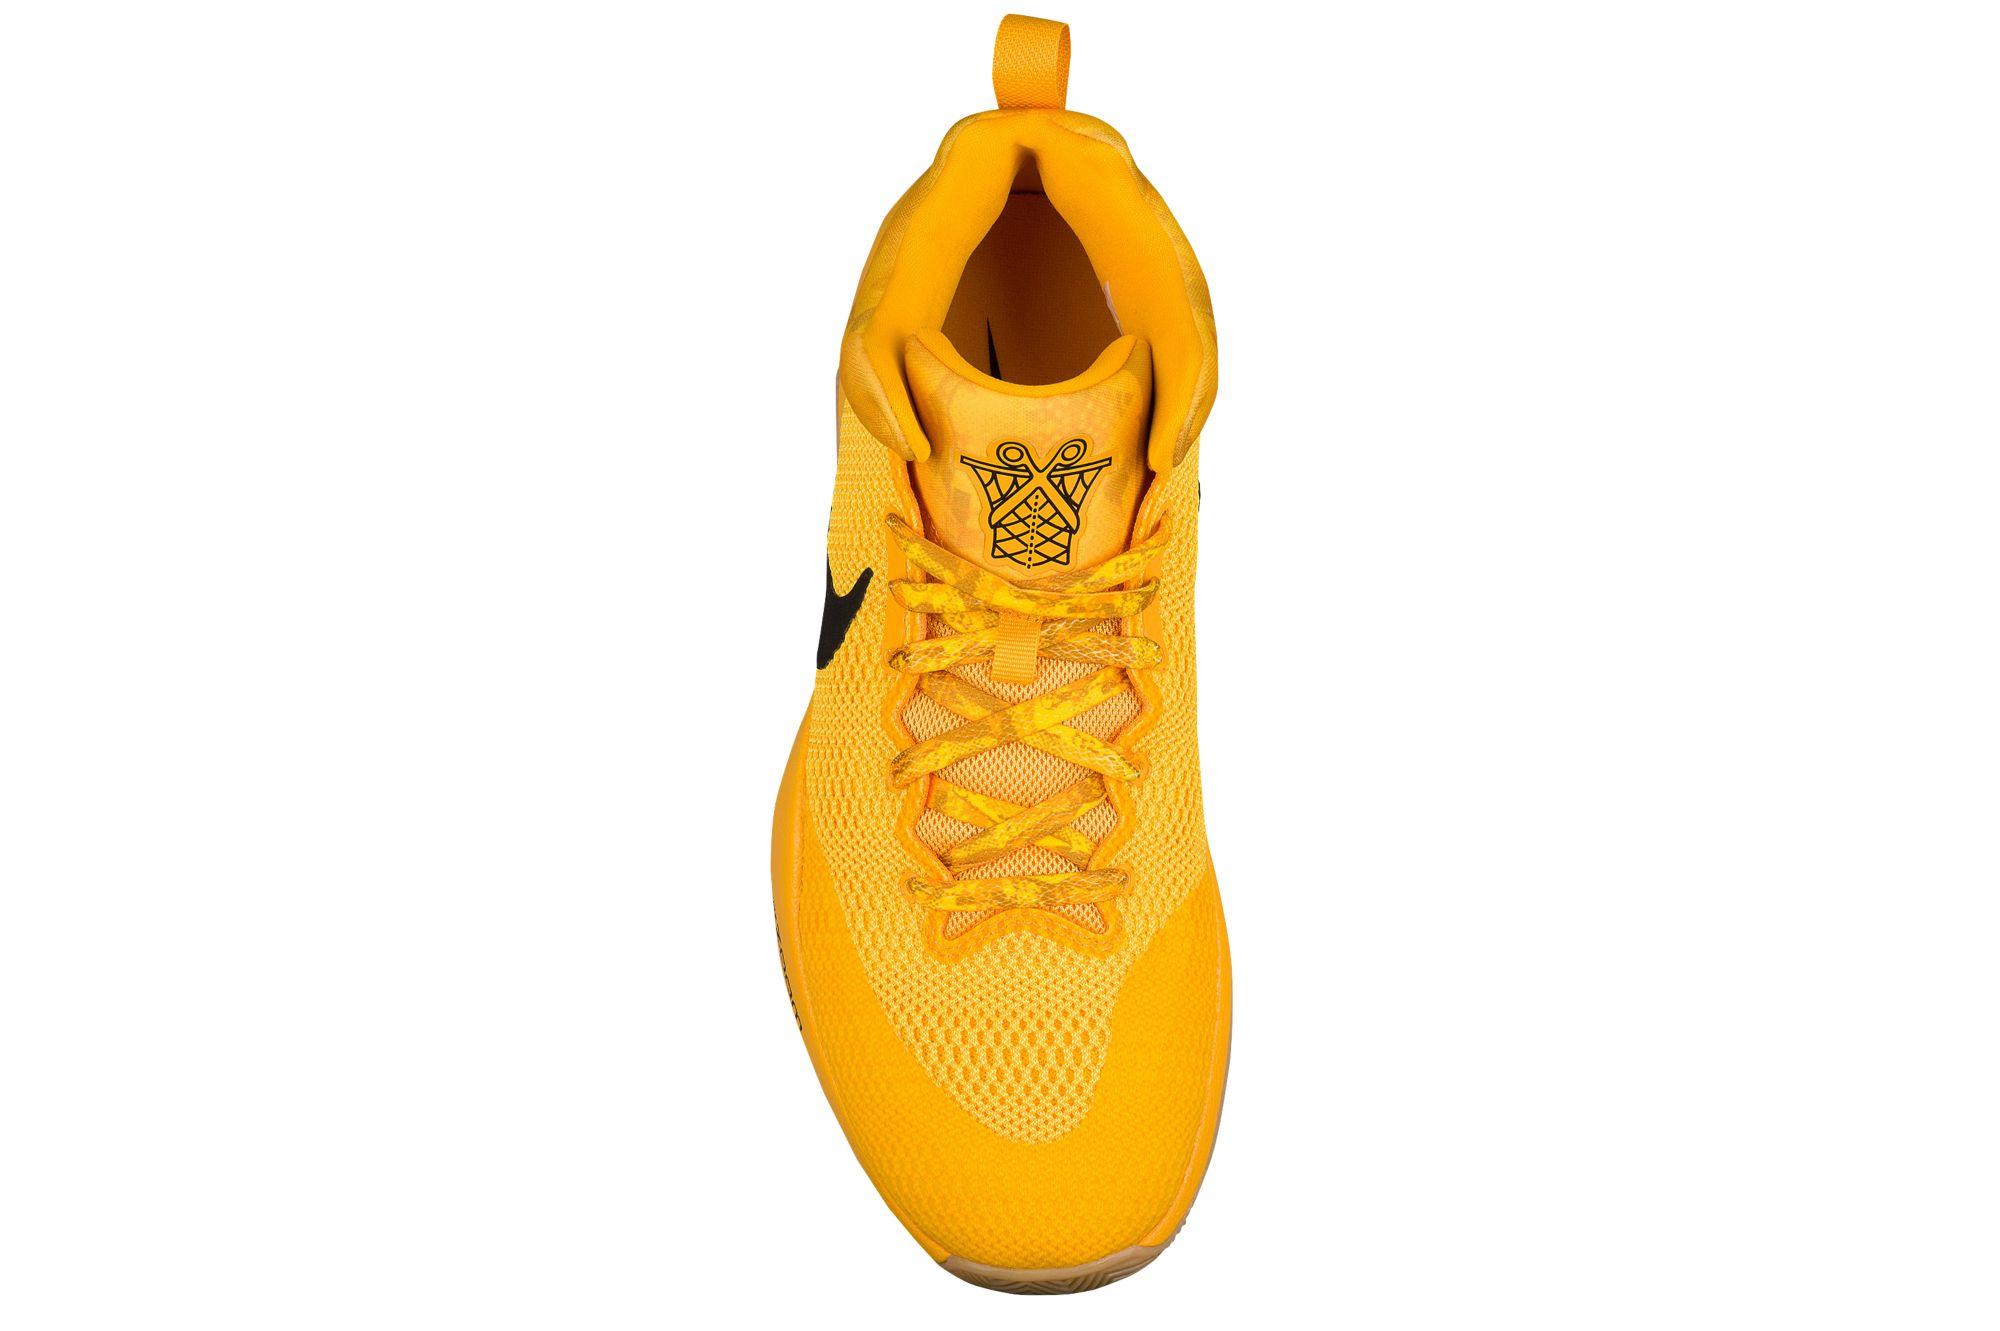 Nike Zoom rev - Tour Yellow - Top